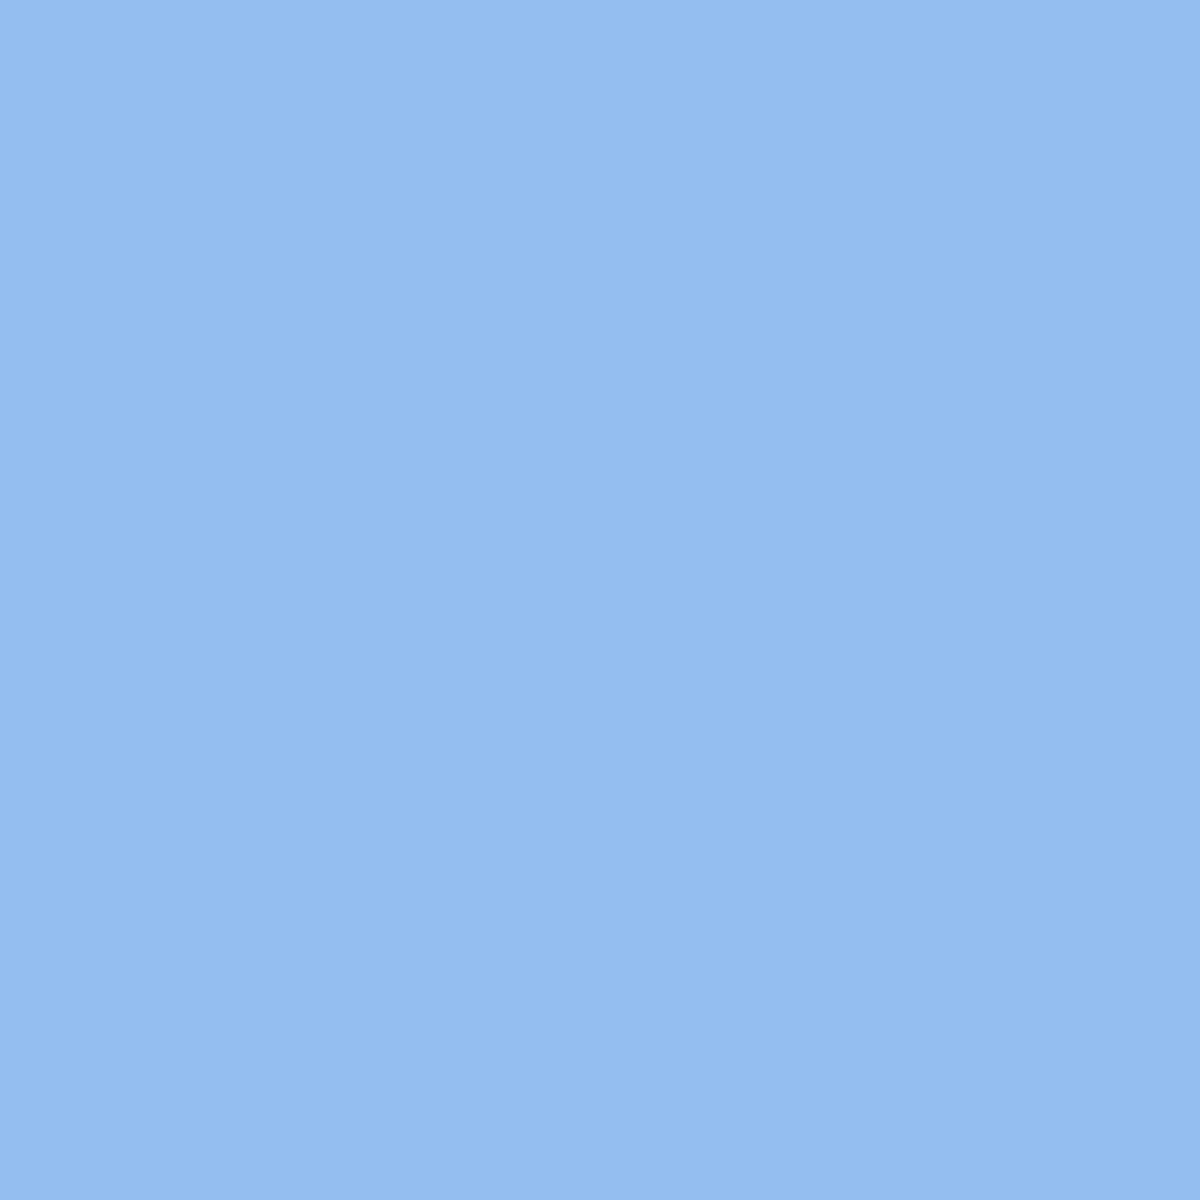 Bild 2 von Baufix Pastell-Color sky